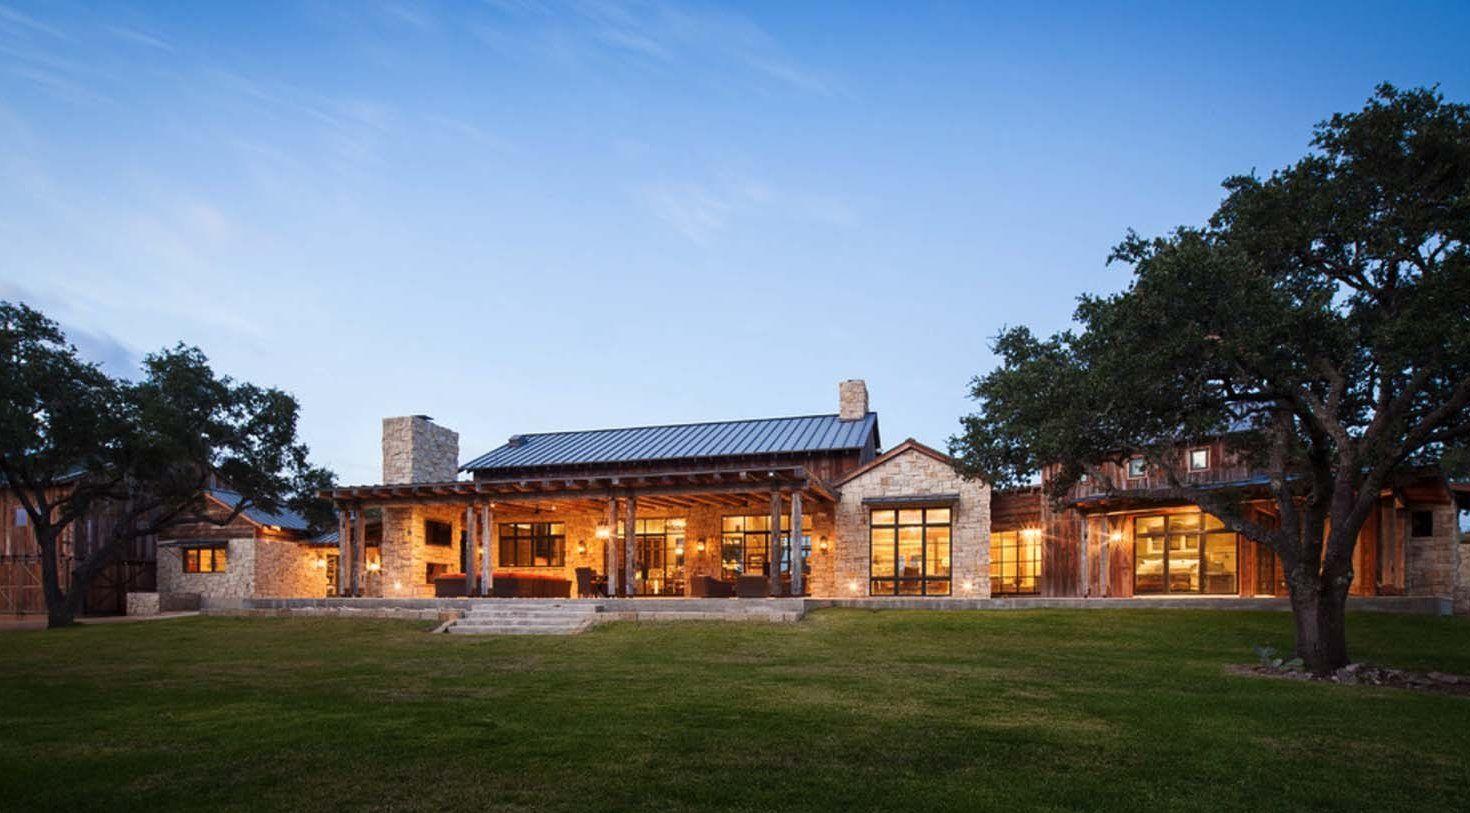 Modern Rustic Barn Style Retreat In Texas Hill Country A Modern Rustic Ranch House Designed As A Family Retreat By Cor 2020 Mimari Ev Tasarim Planlari Tasarim Evler